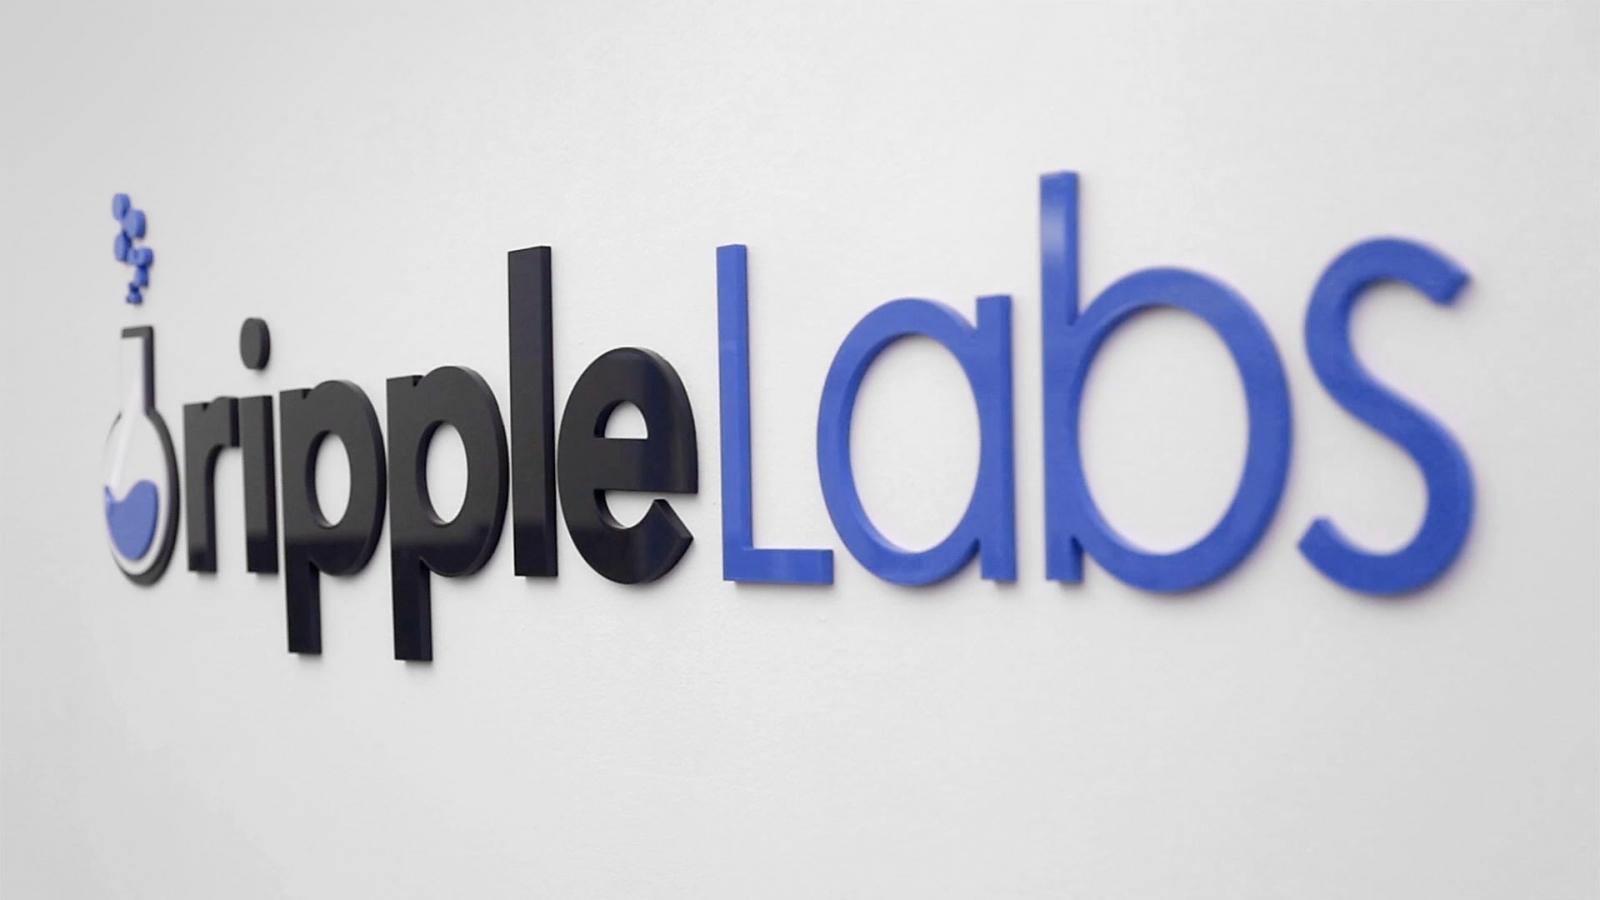 Ripple Labs Logo